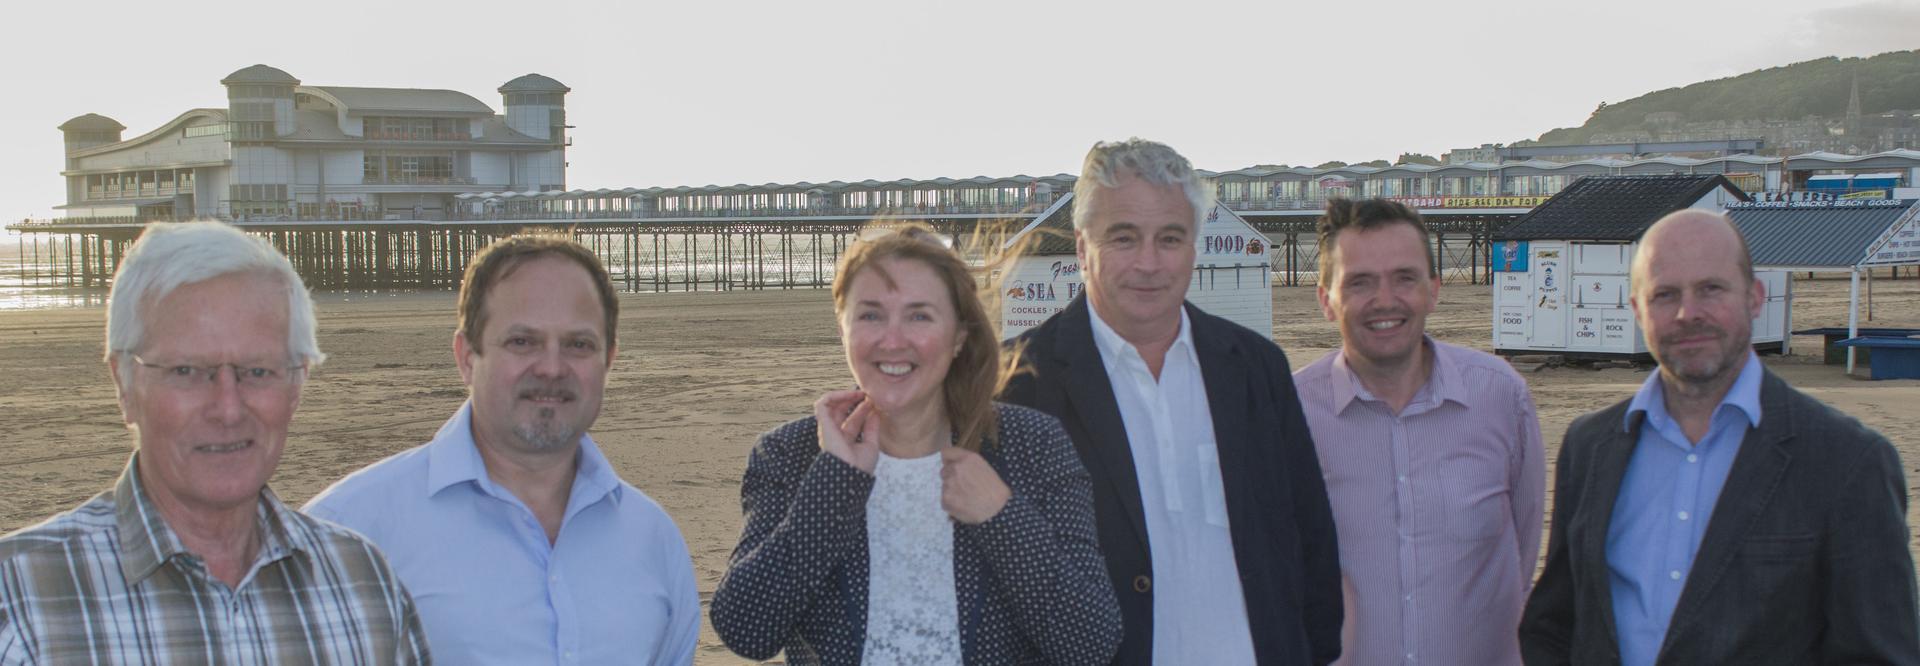 Weston Liberal Democrats